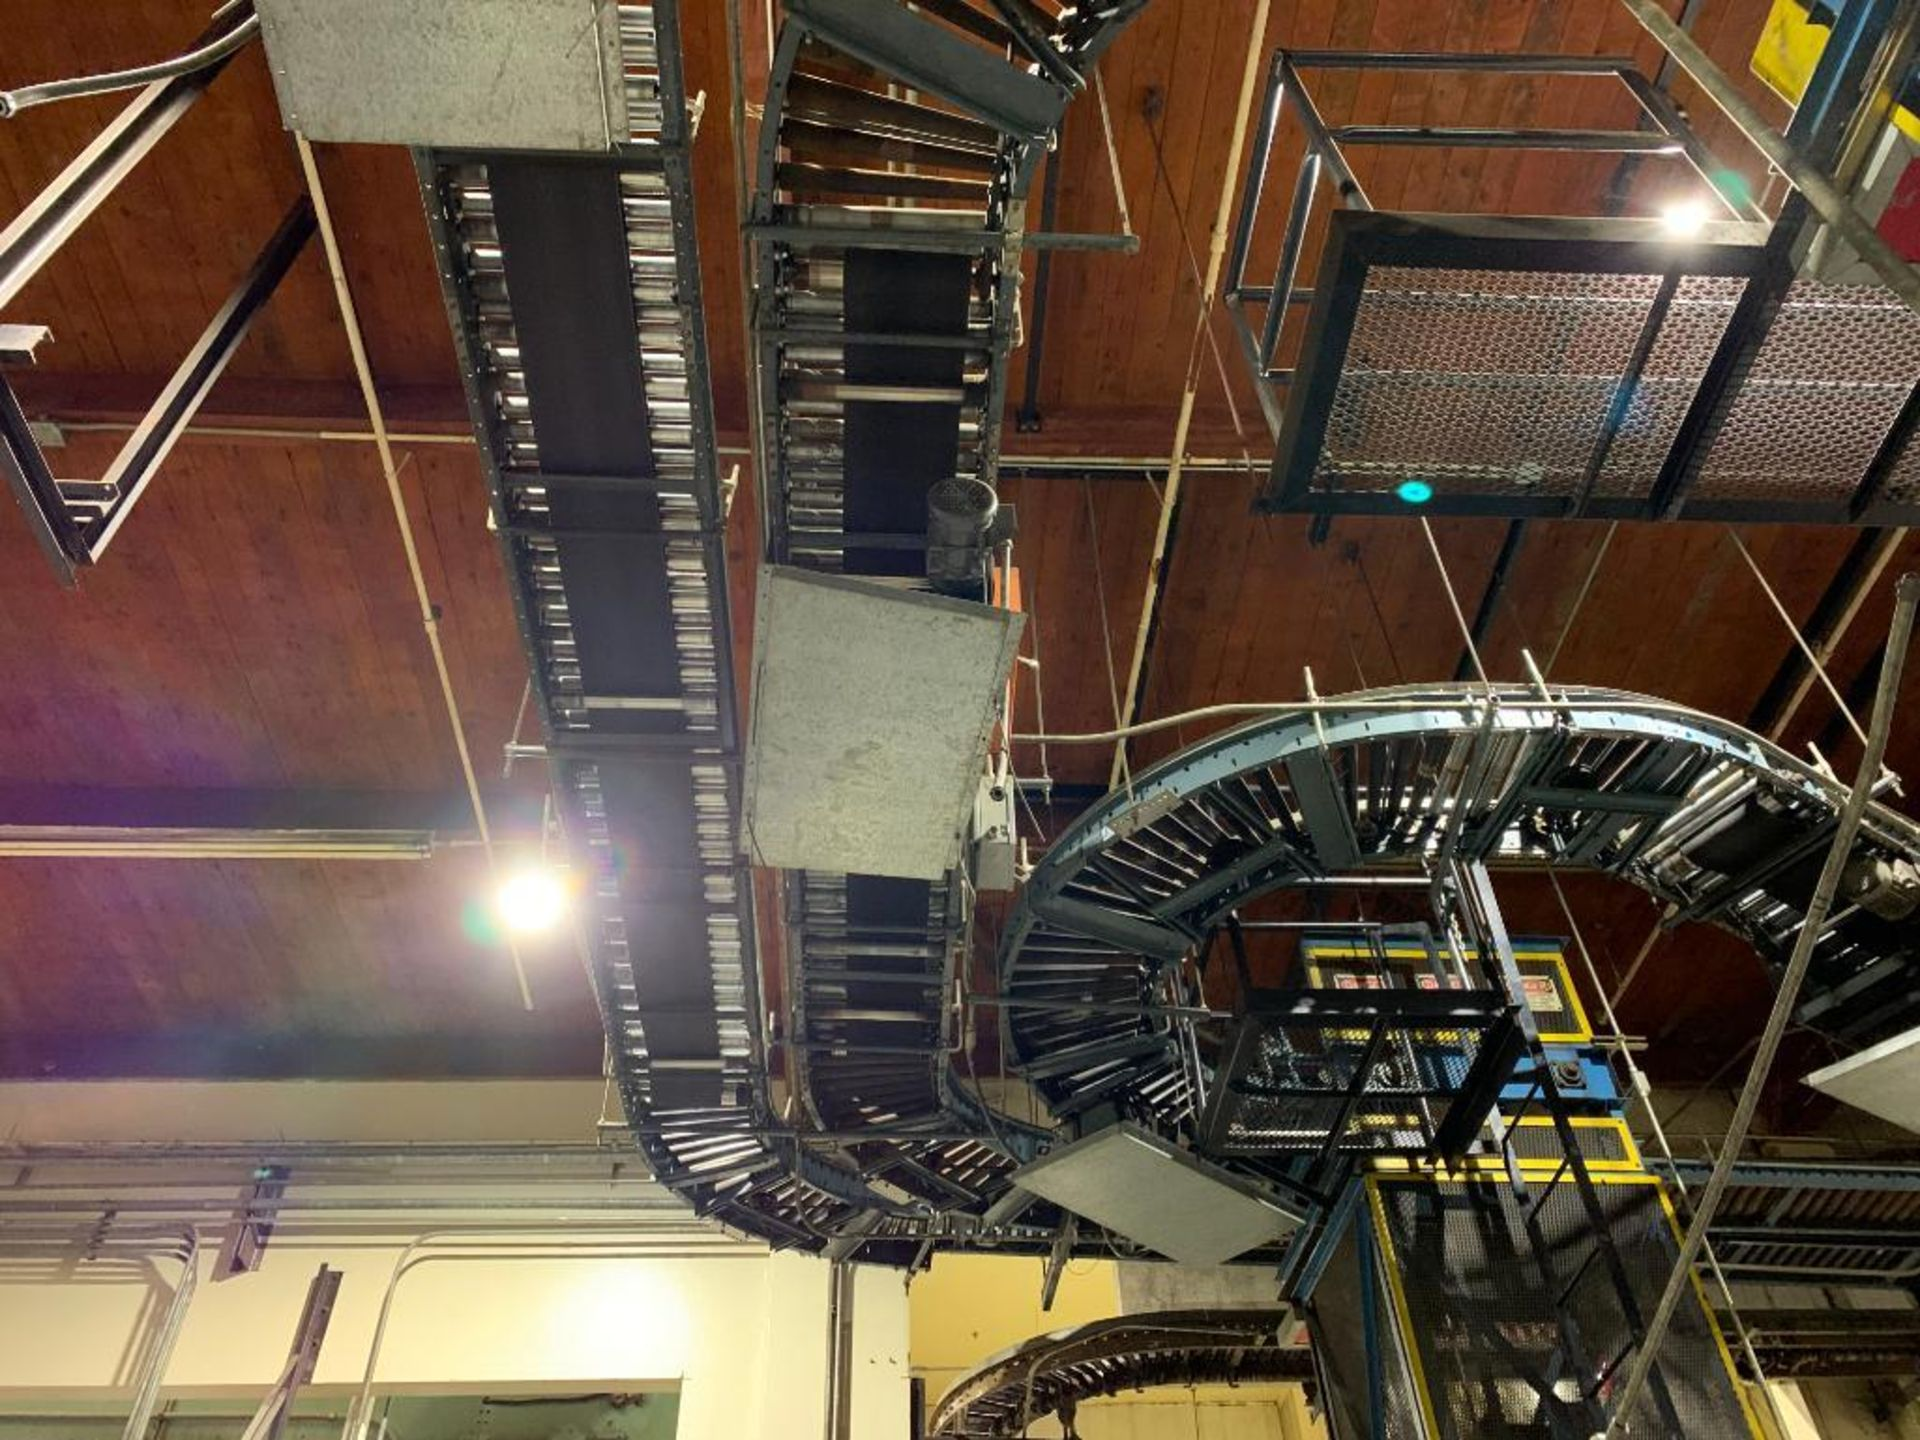 overhead power case conveyor - Image 2 of 3